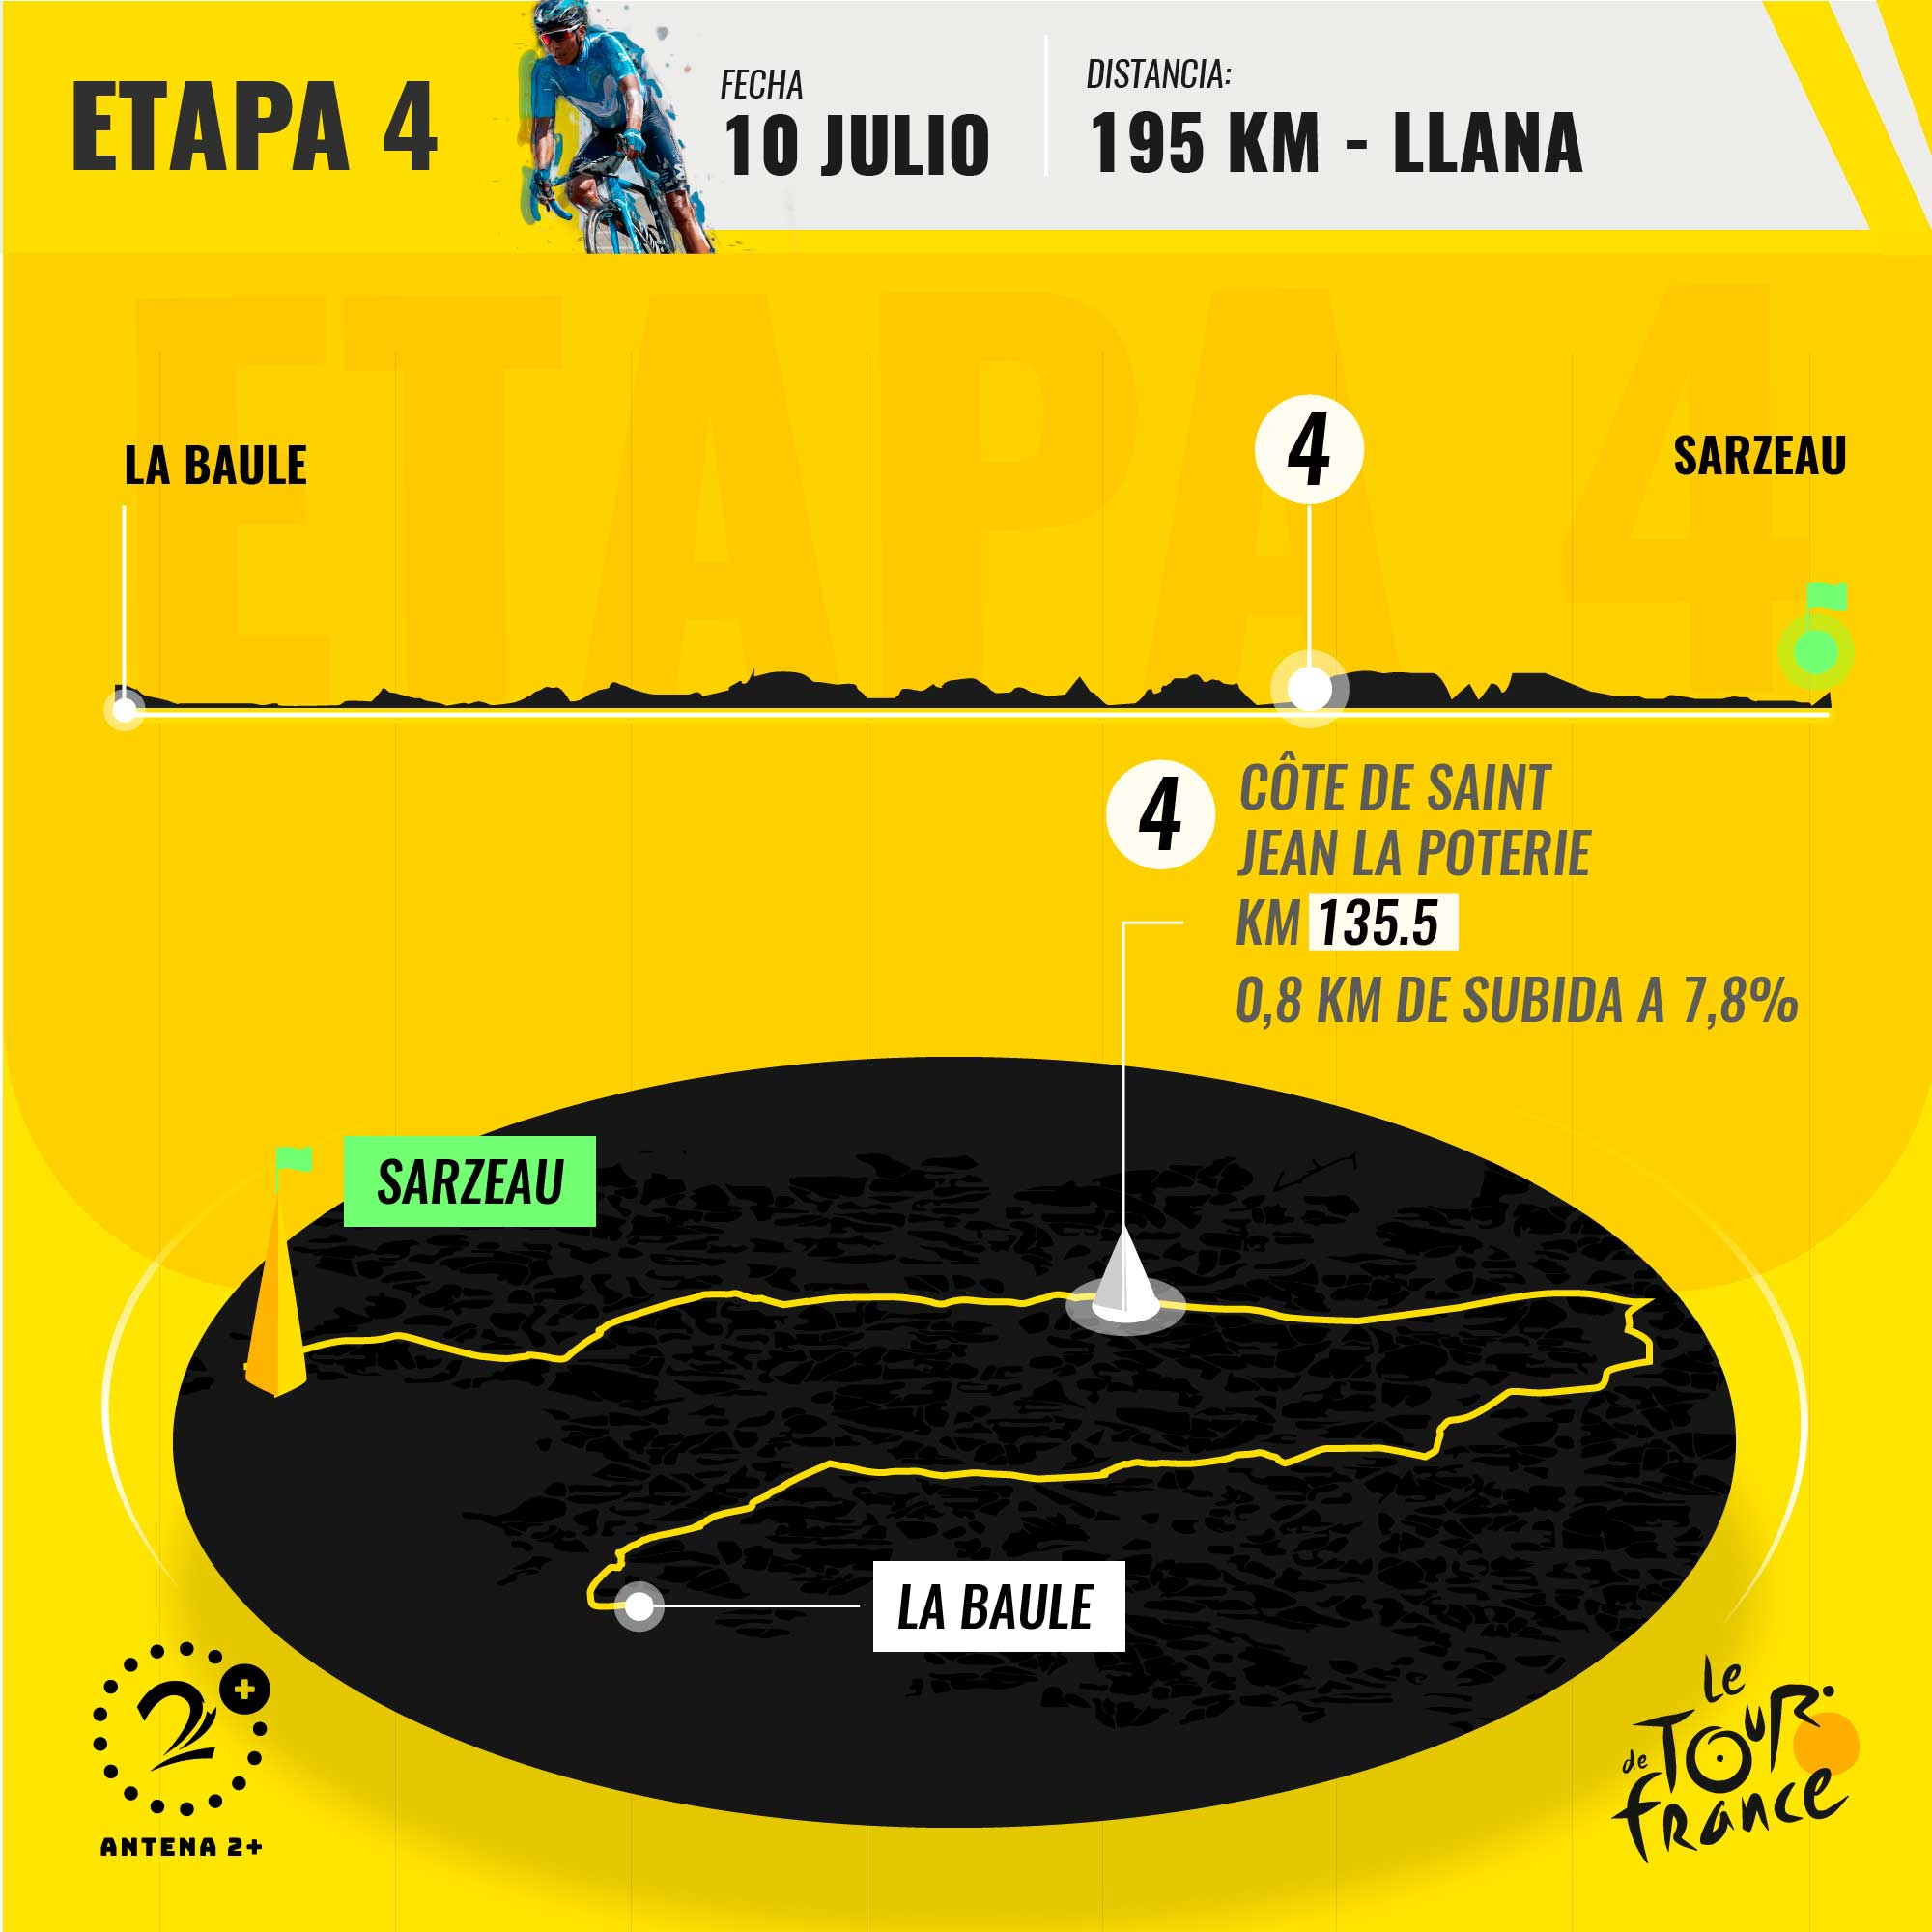 Recorrido de la cuarta etapa del Tour de Francia 2018